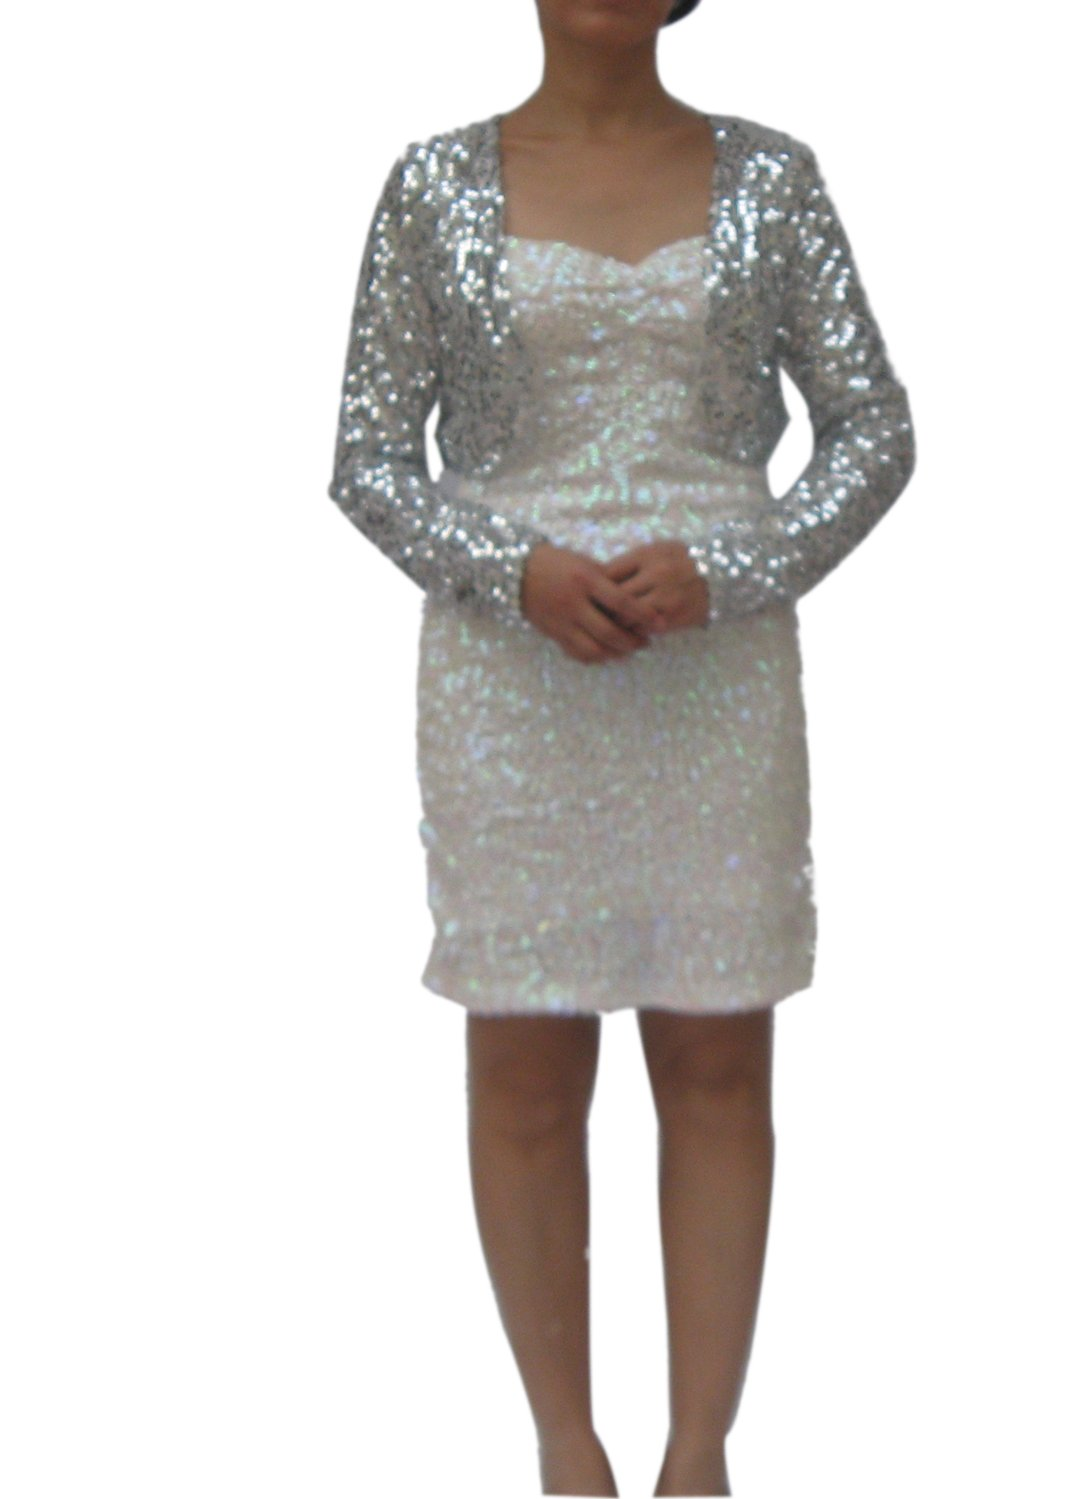 Whitewed Sequined Bolero Style Wraps Shrugs Jacket Cardigan Evening Party Gown Silver